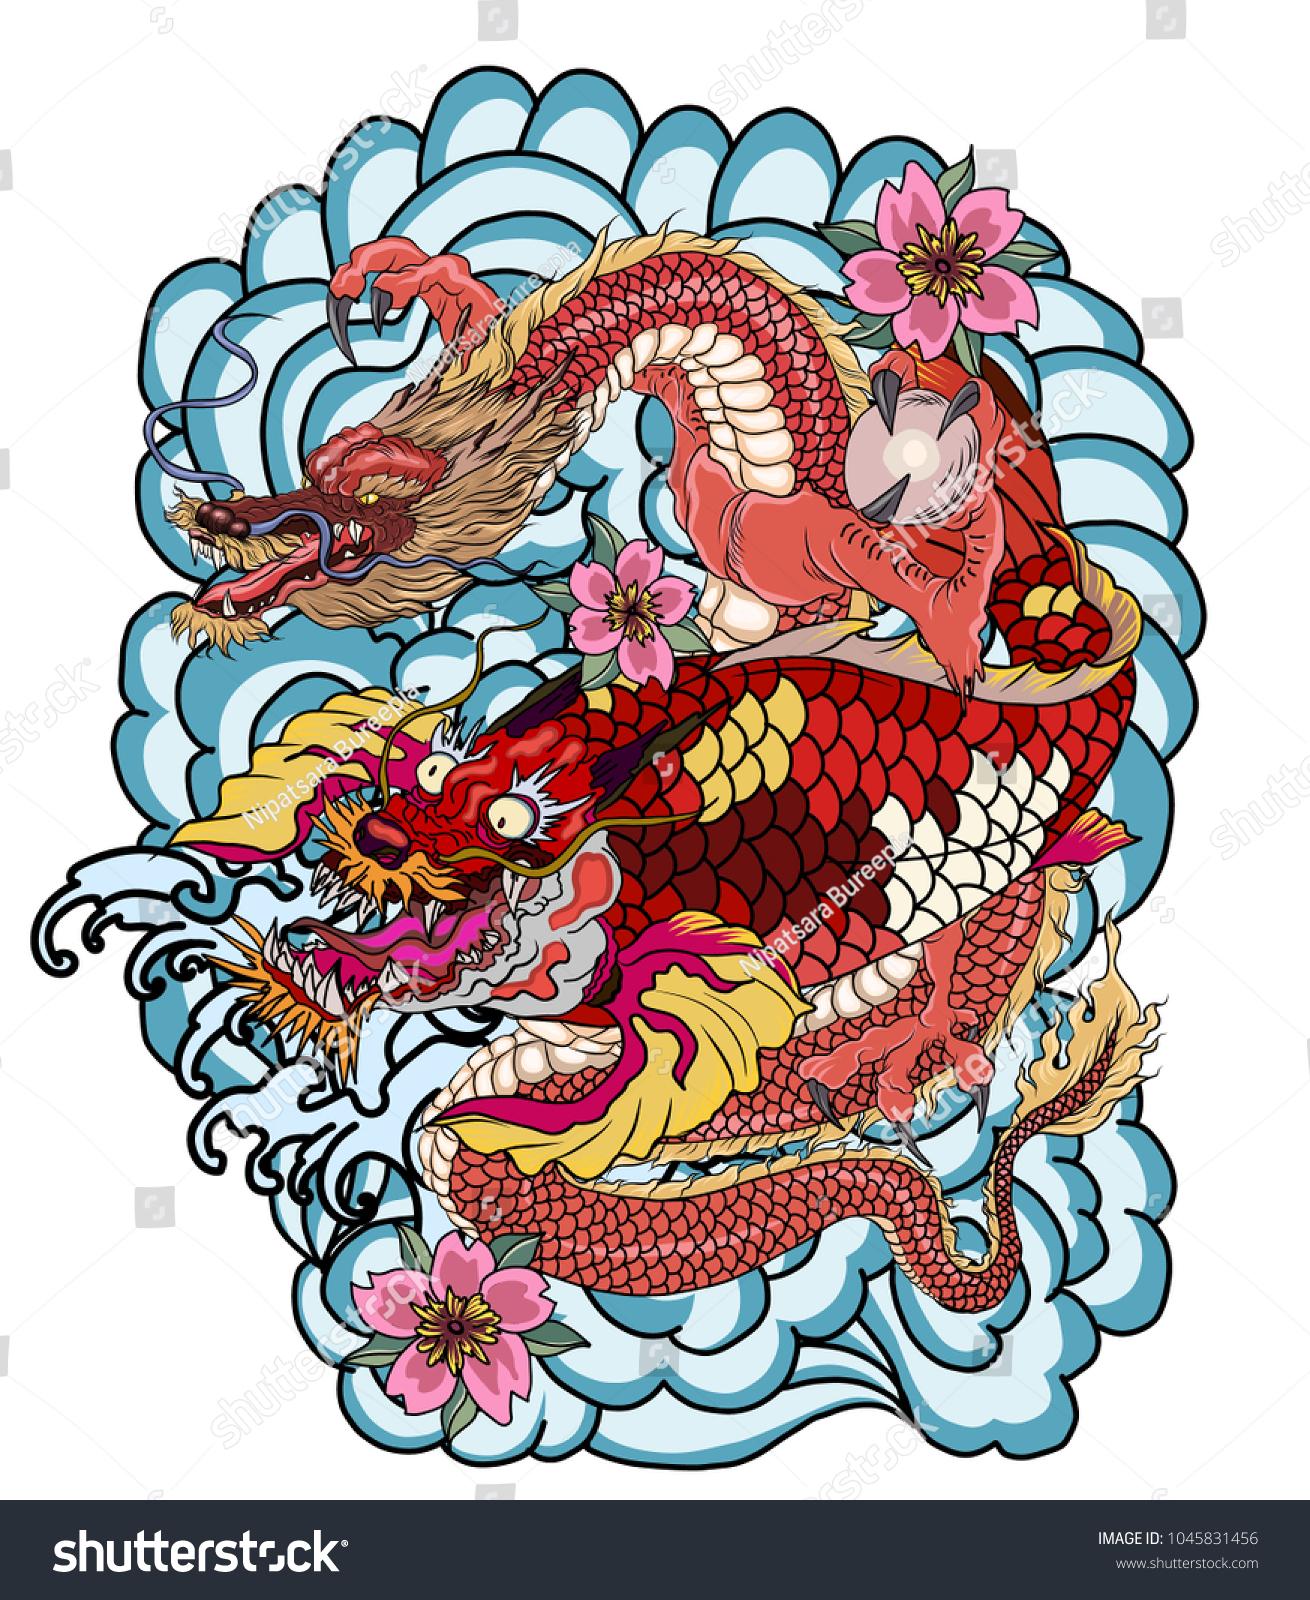 Dragon koi dragon lotus flower tattoopeach stock vector 2018 dragon with koi dragon and lotus flower tattooach with sakura and plum flower on izmirmasajfo